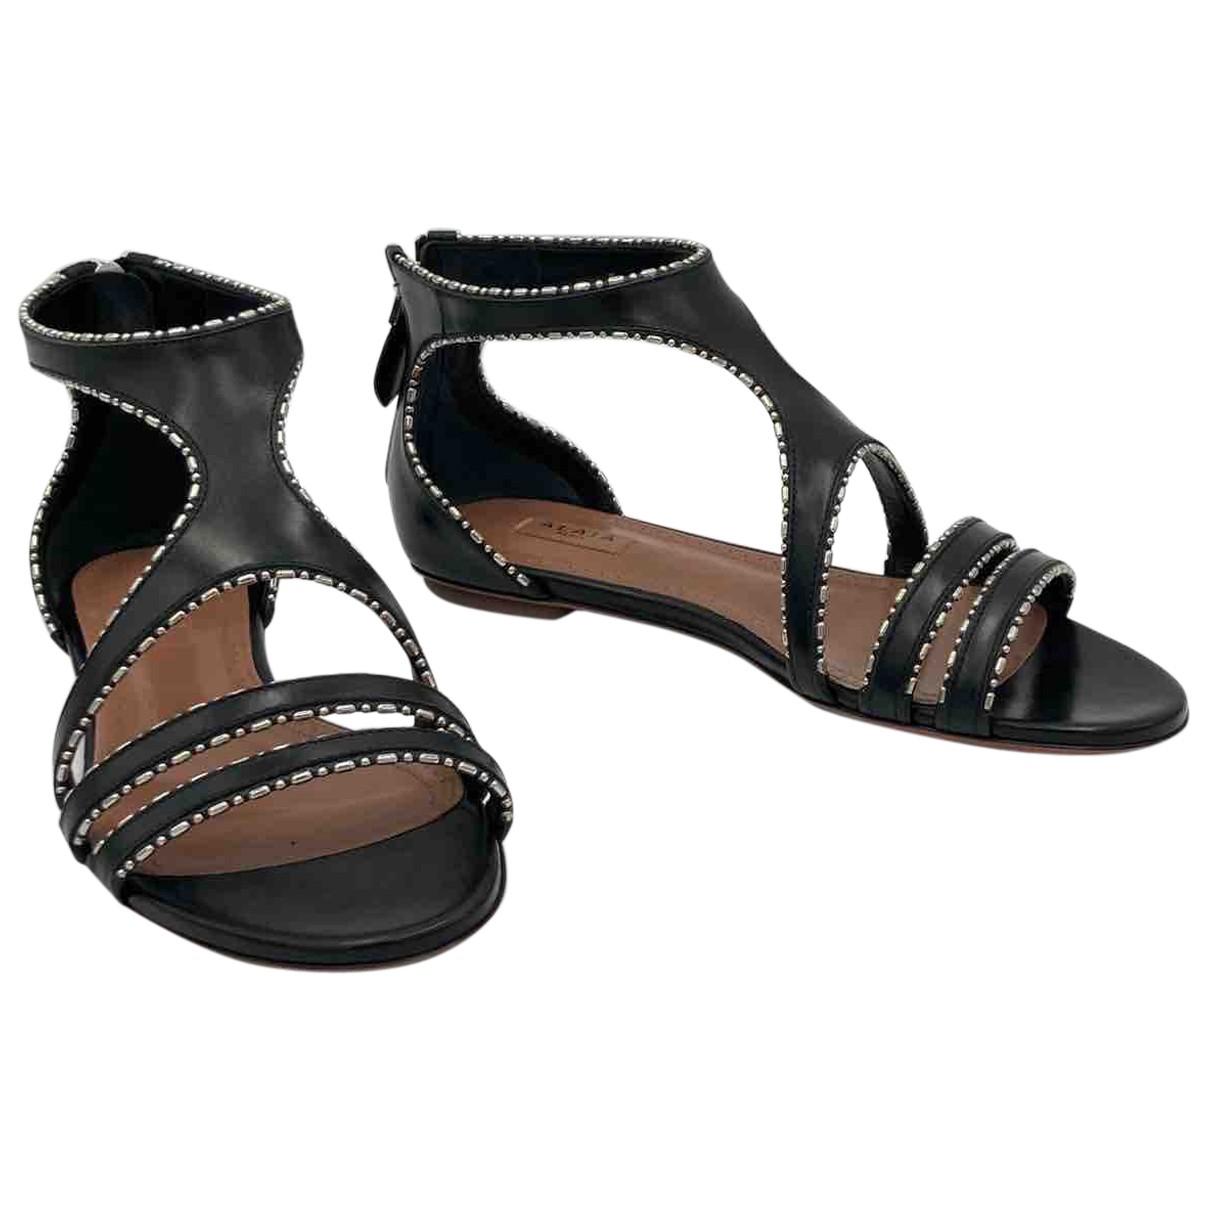 Alaïa N Black Leather Flats for Women 37 EU